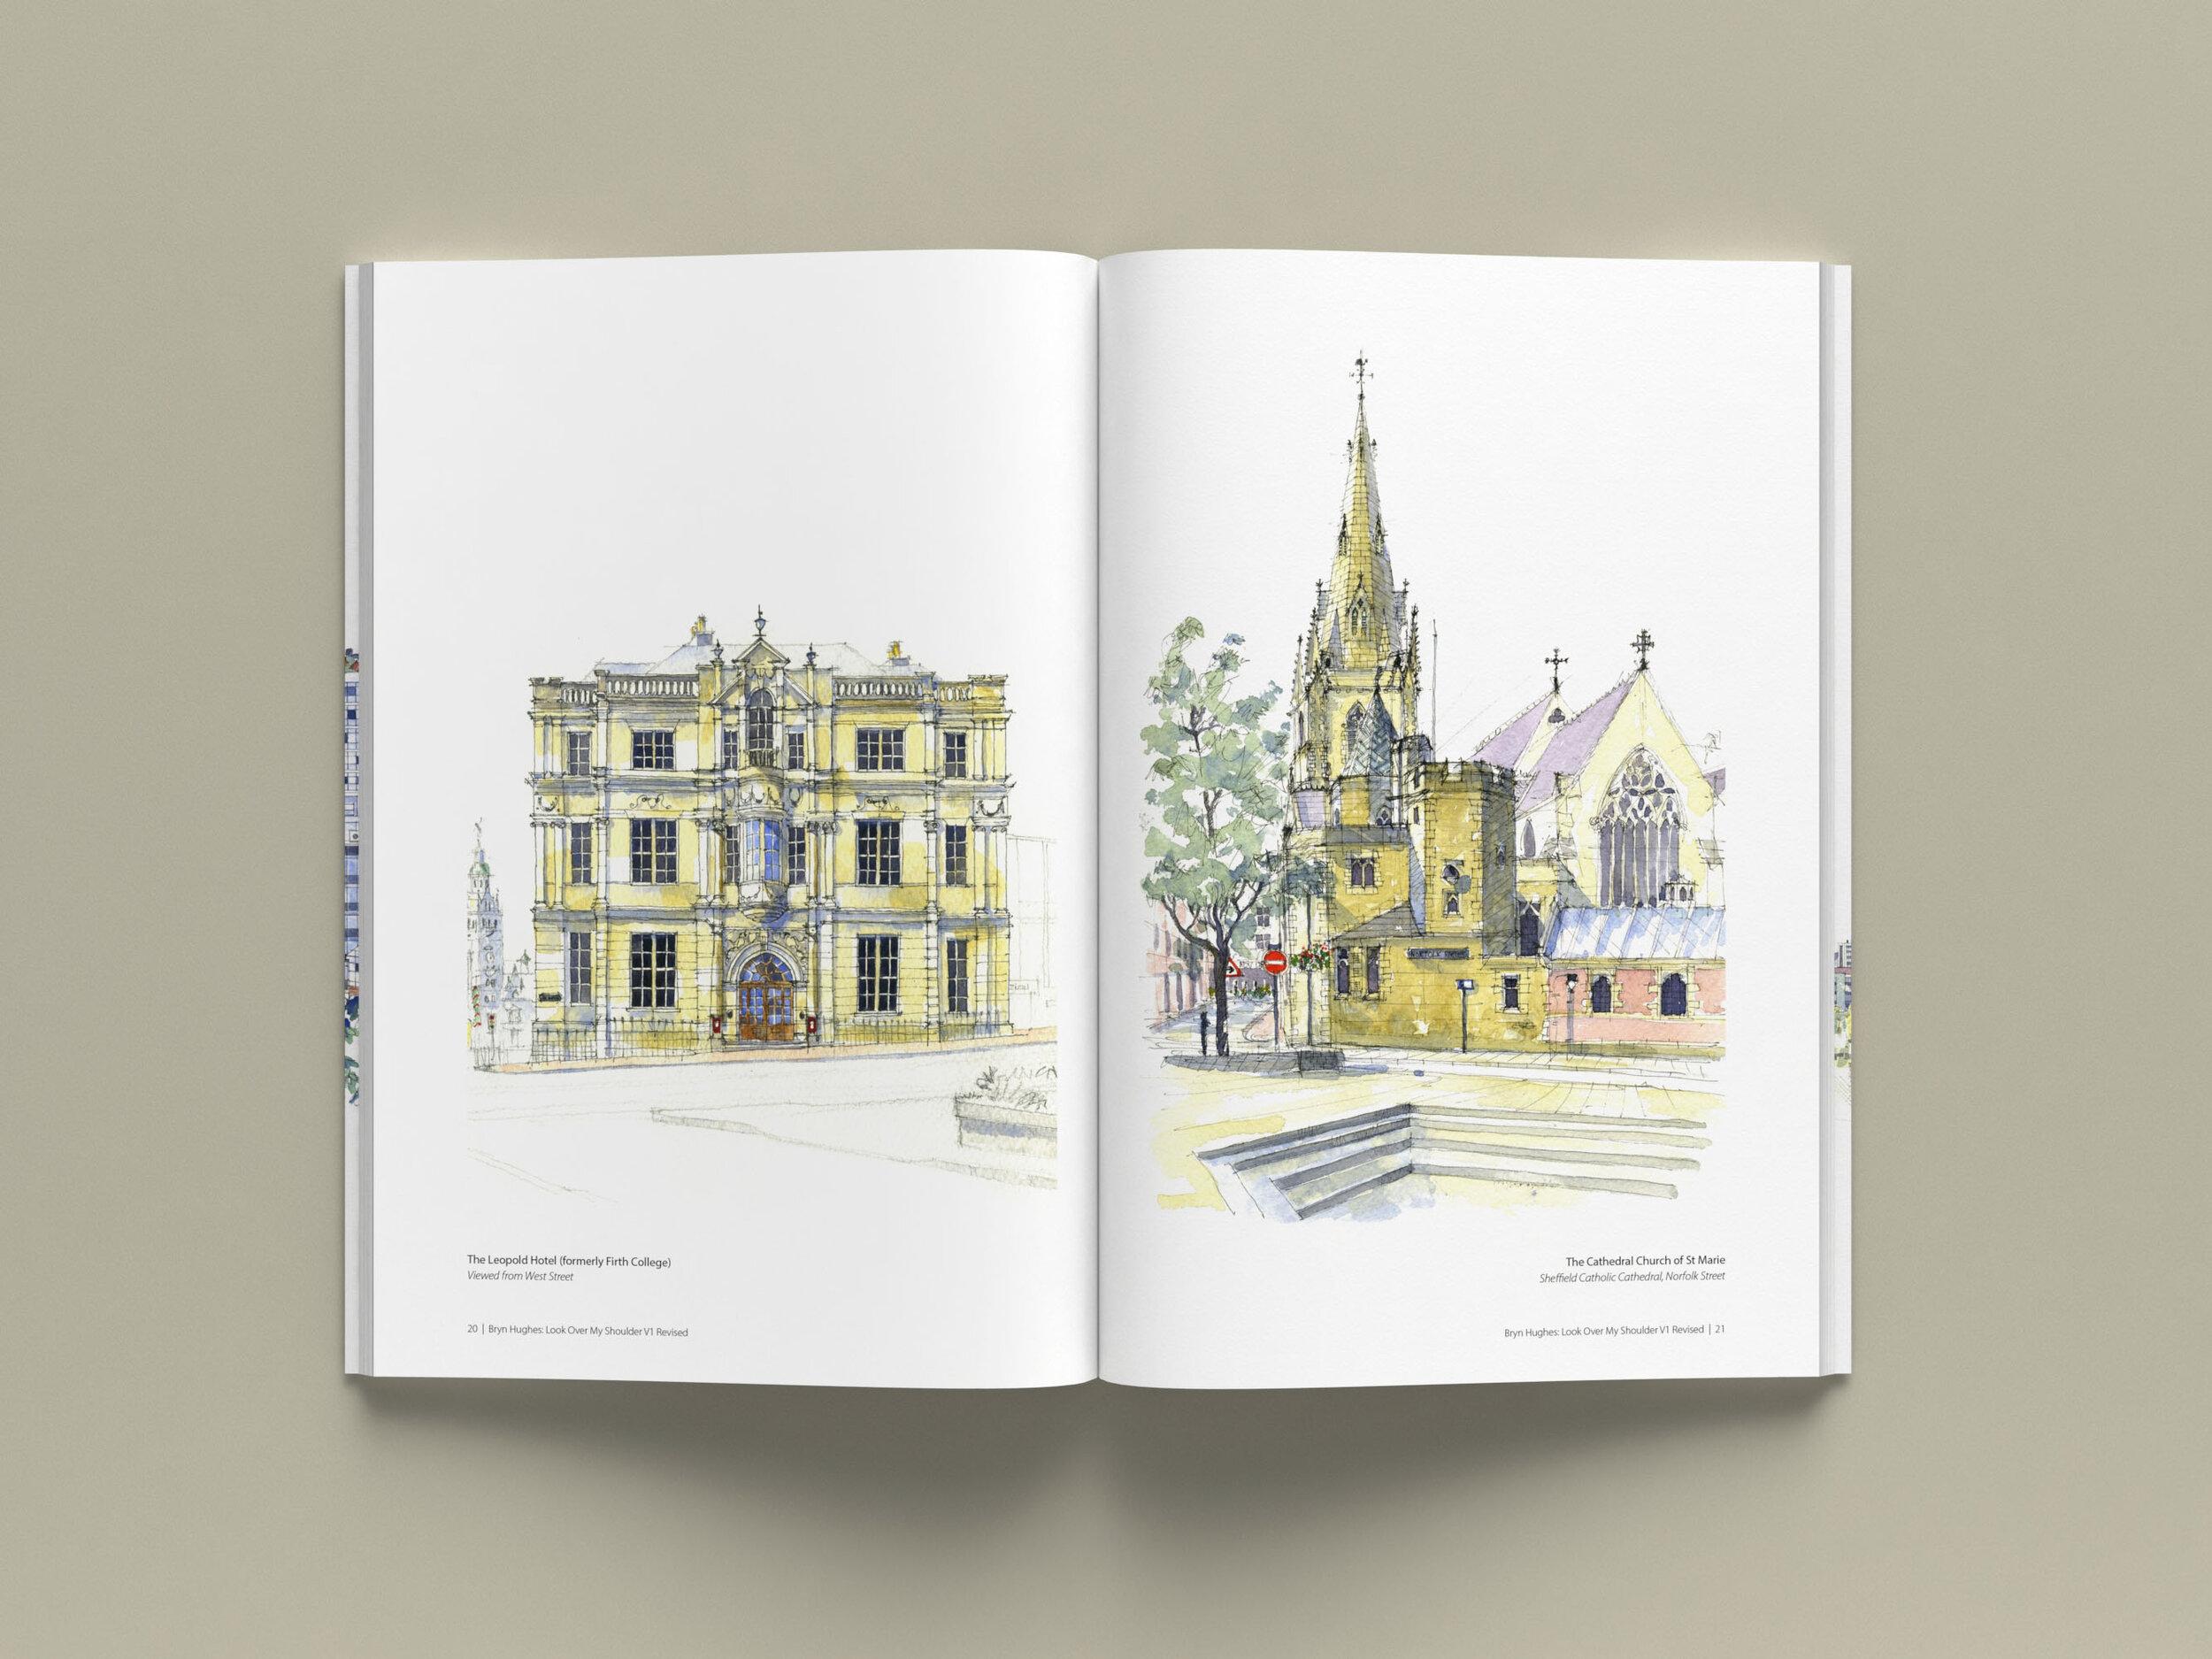 BRYN-HUGHES-ARTIST-SOFTBACK-BOOK02-B-_0031_Group 11.jpg